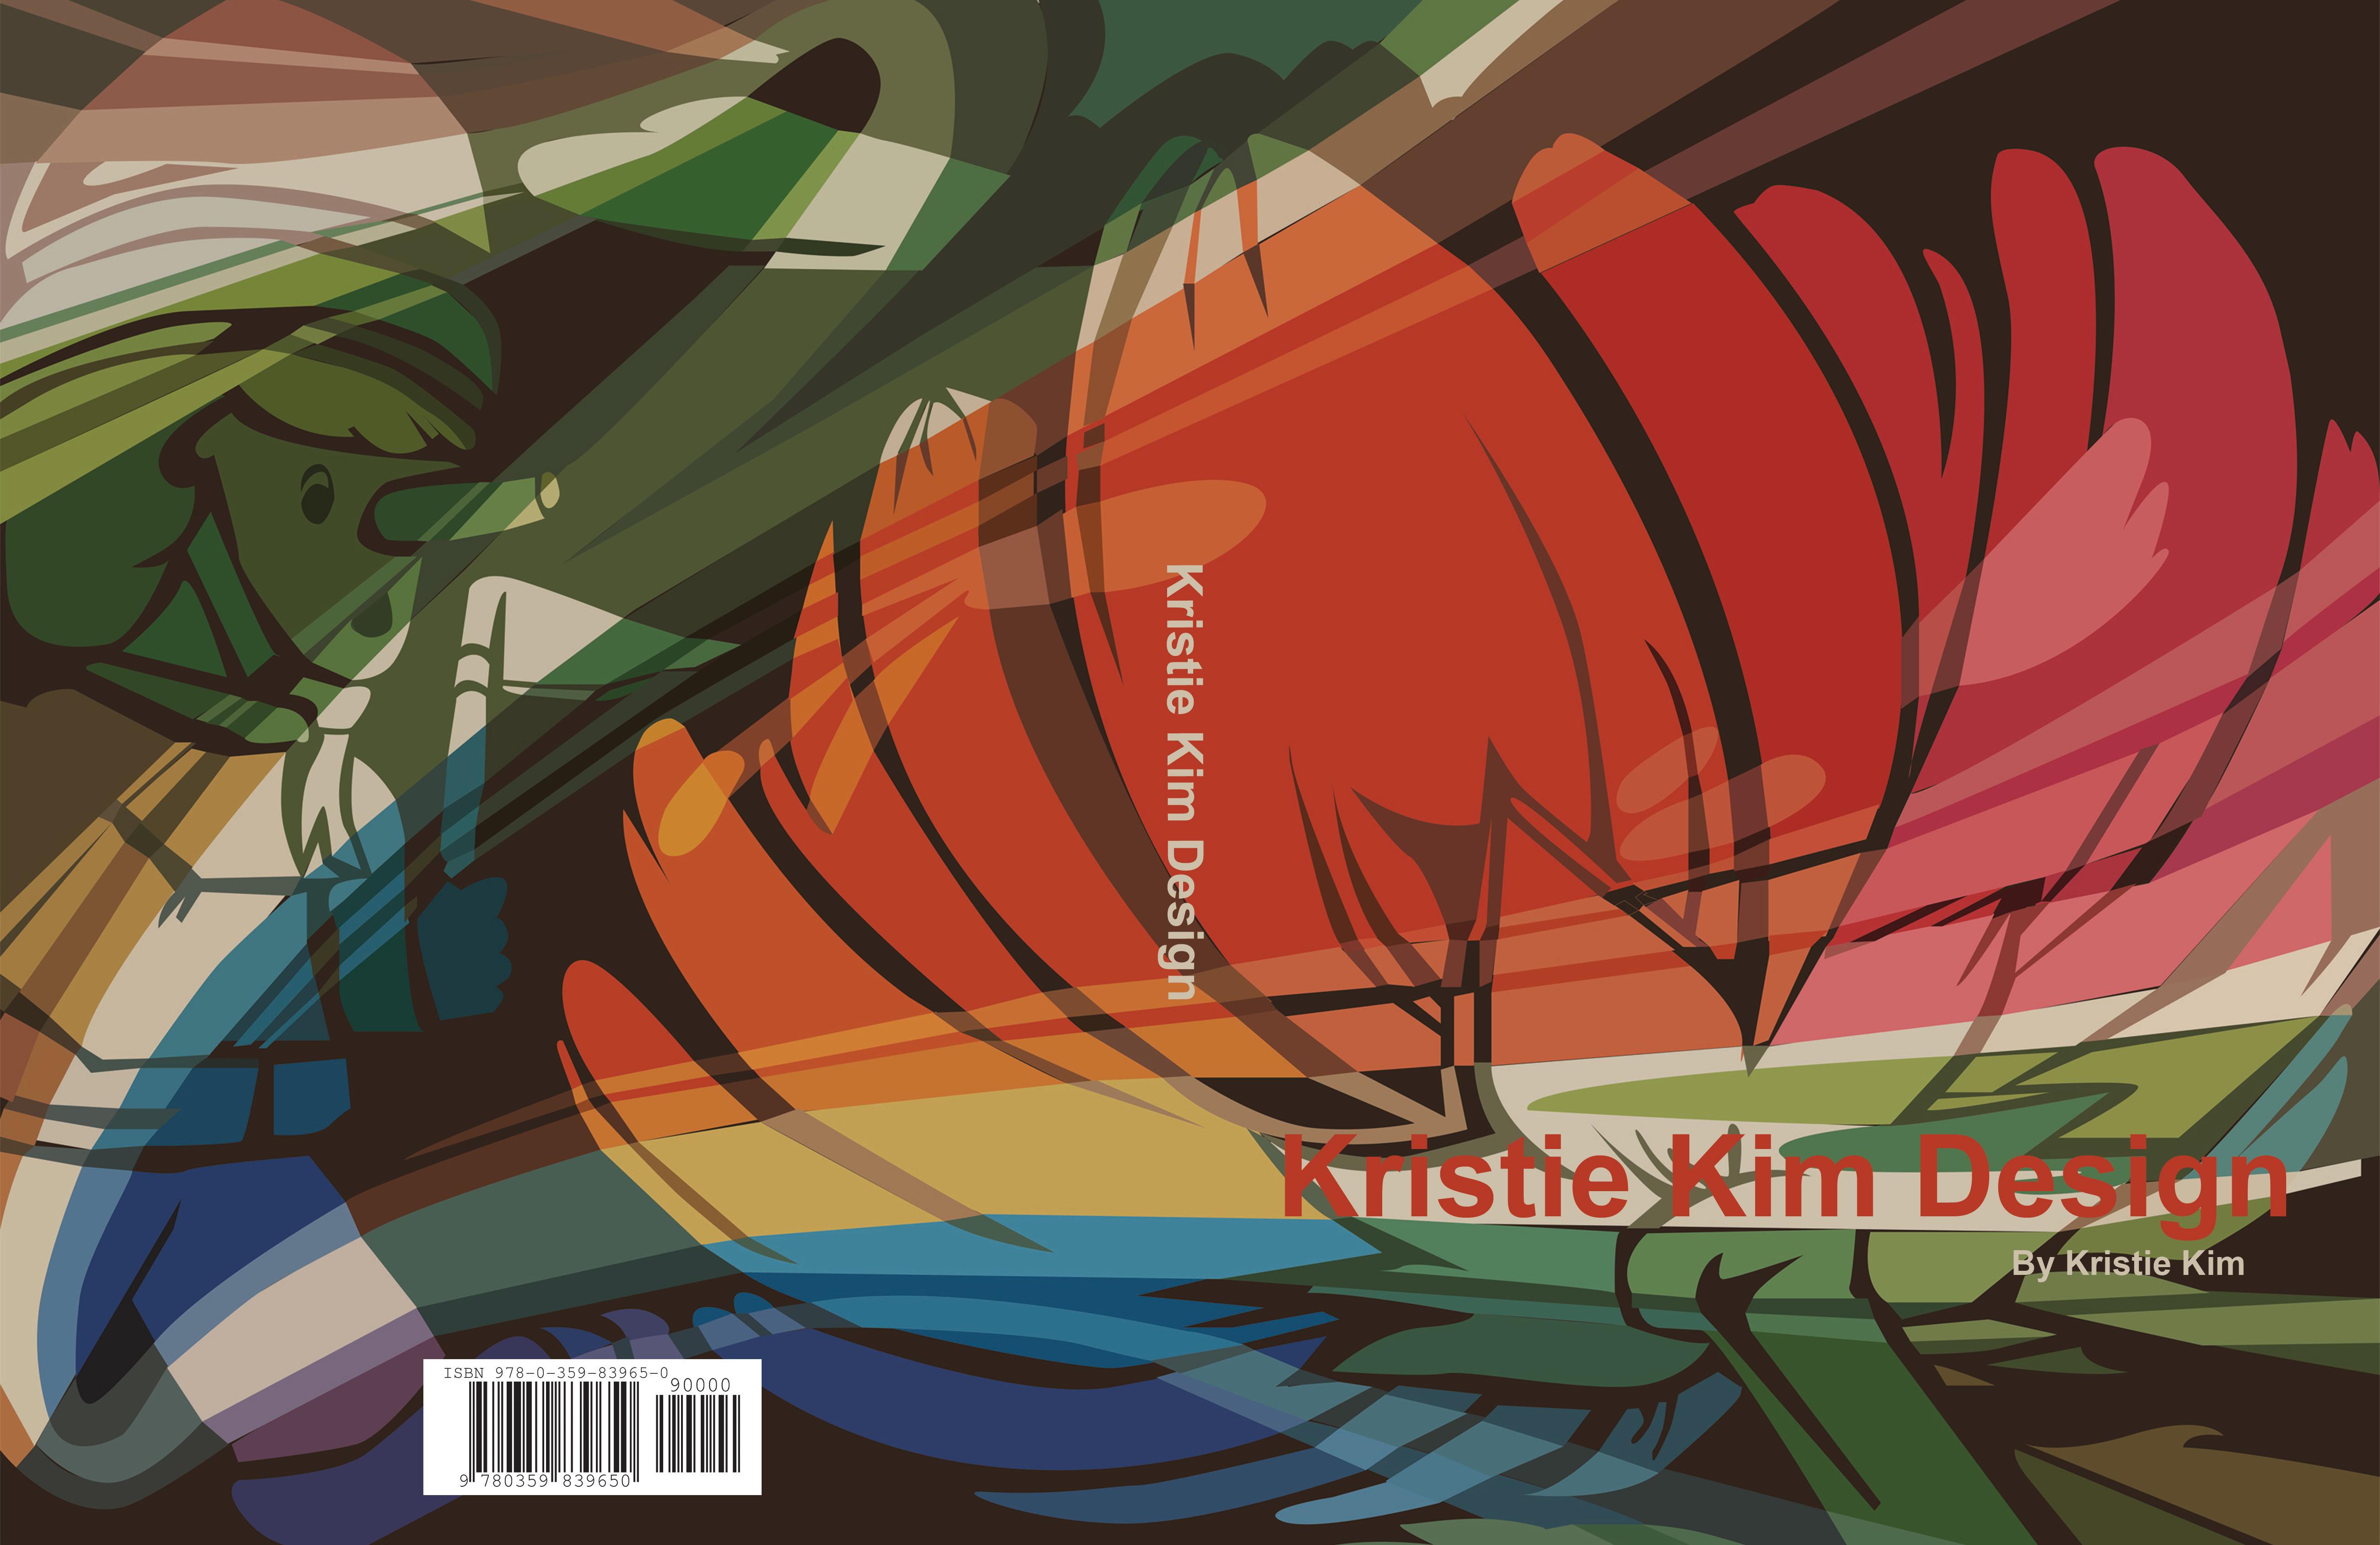 Kristie Kim Design